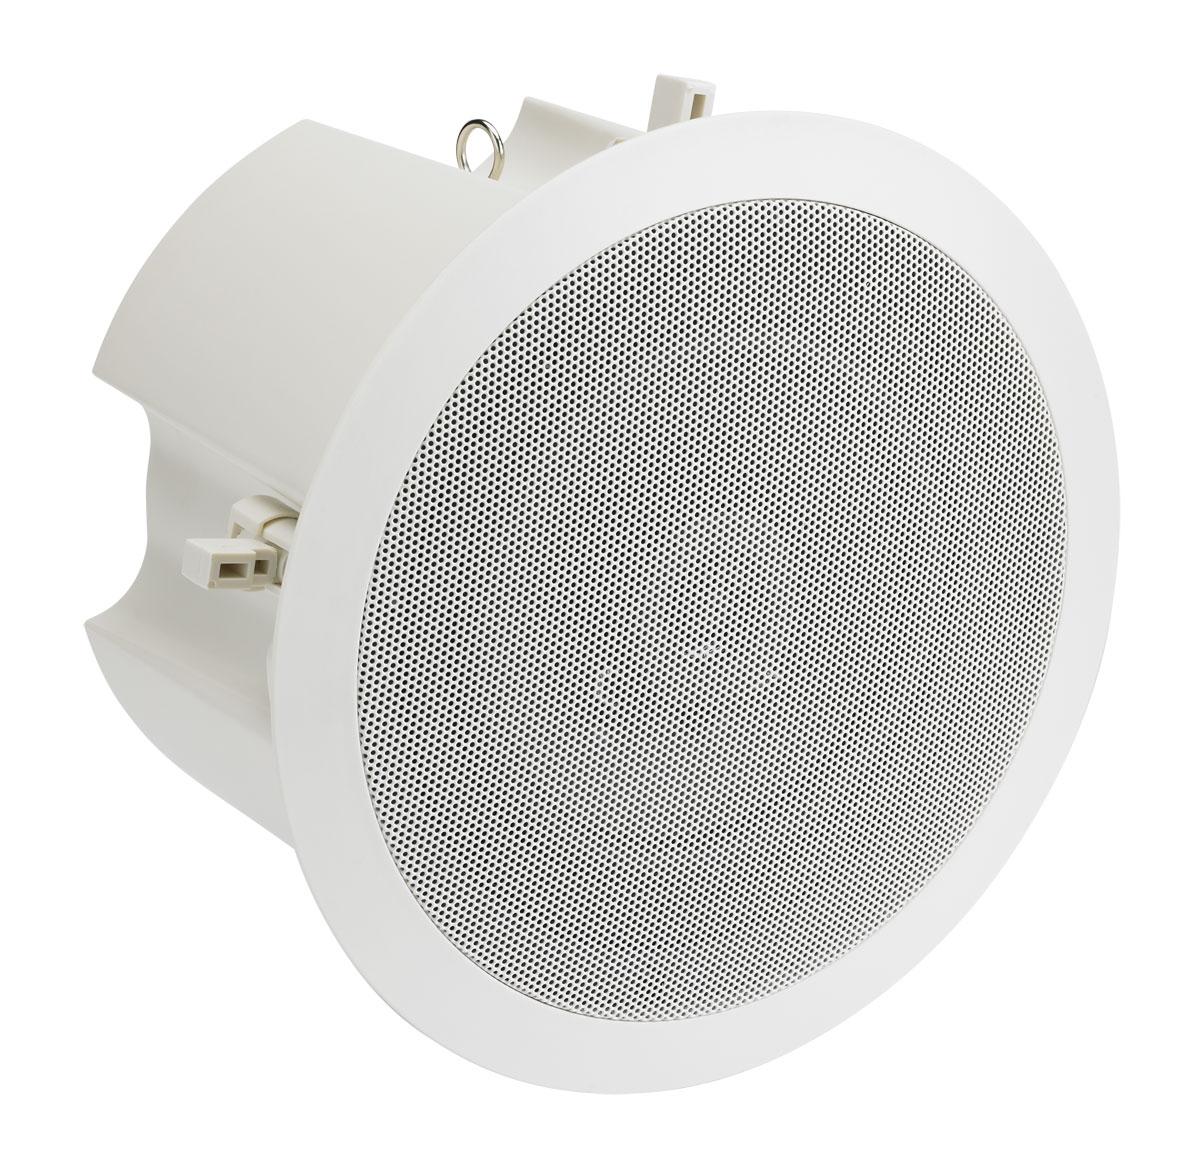 Ceiling speaker 6.5ÔǦ 60W at 8 ohms and 70-100V